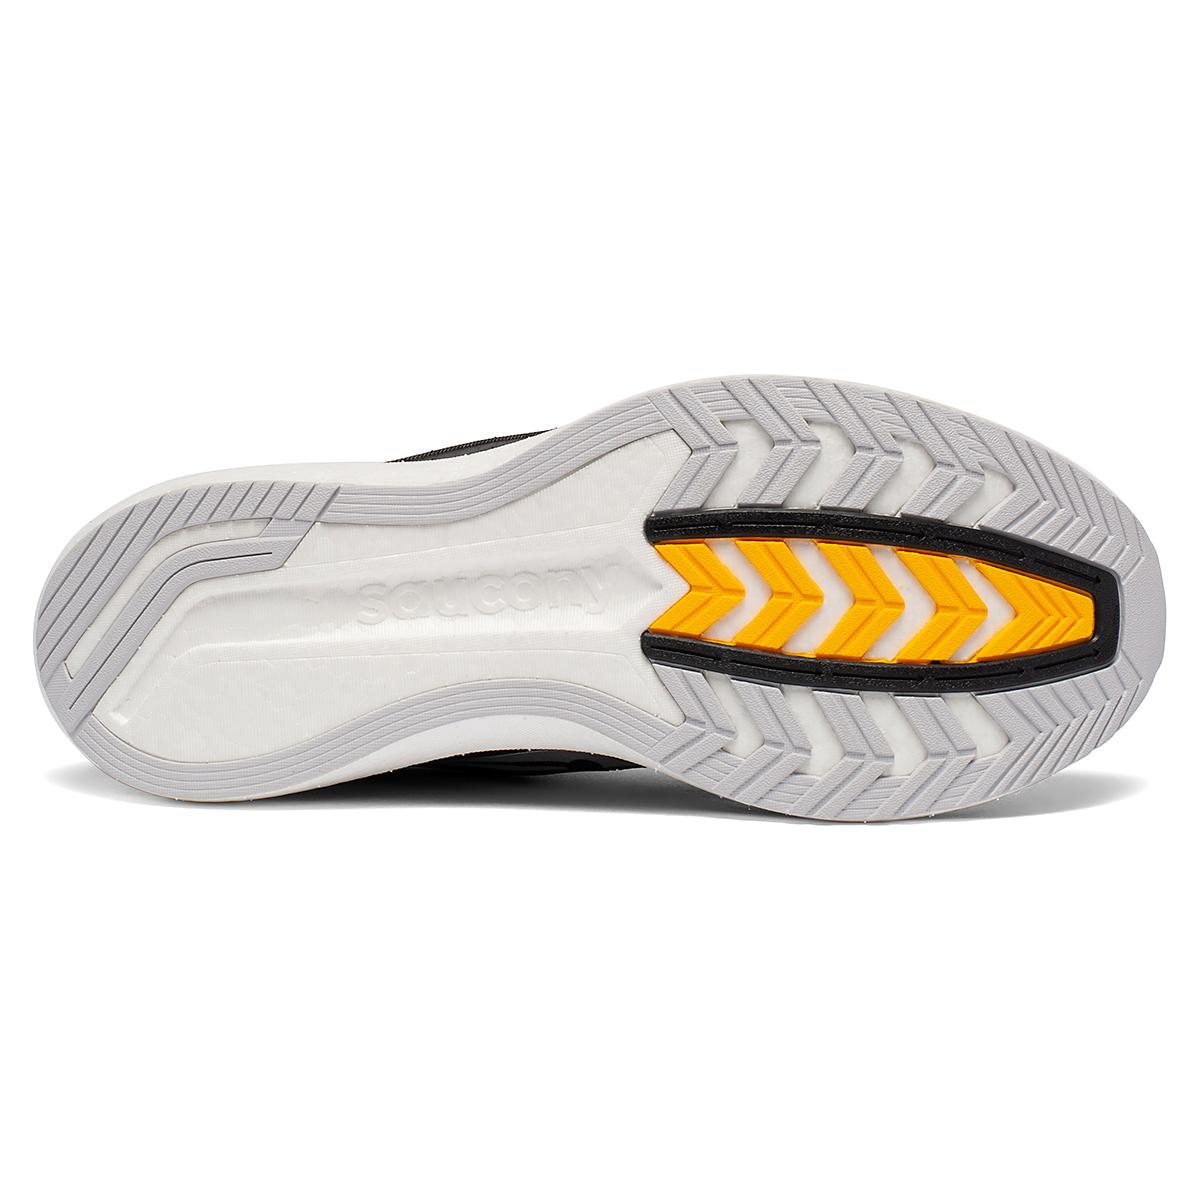 Men's Saucony Endorphin Pro Running Shoe - Color: Black/Silver - Size: 7 - Width: Regular, Black/Silver, large, image 5